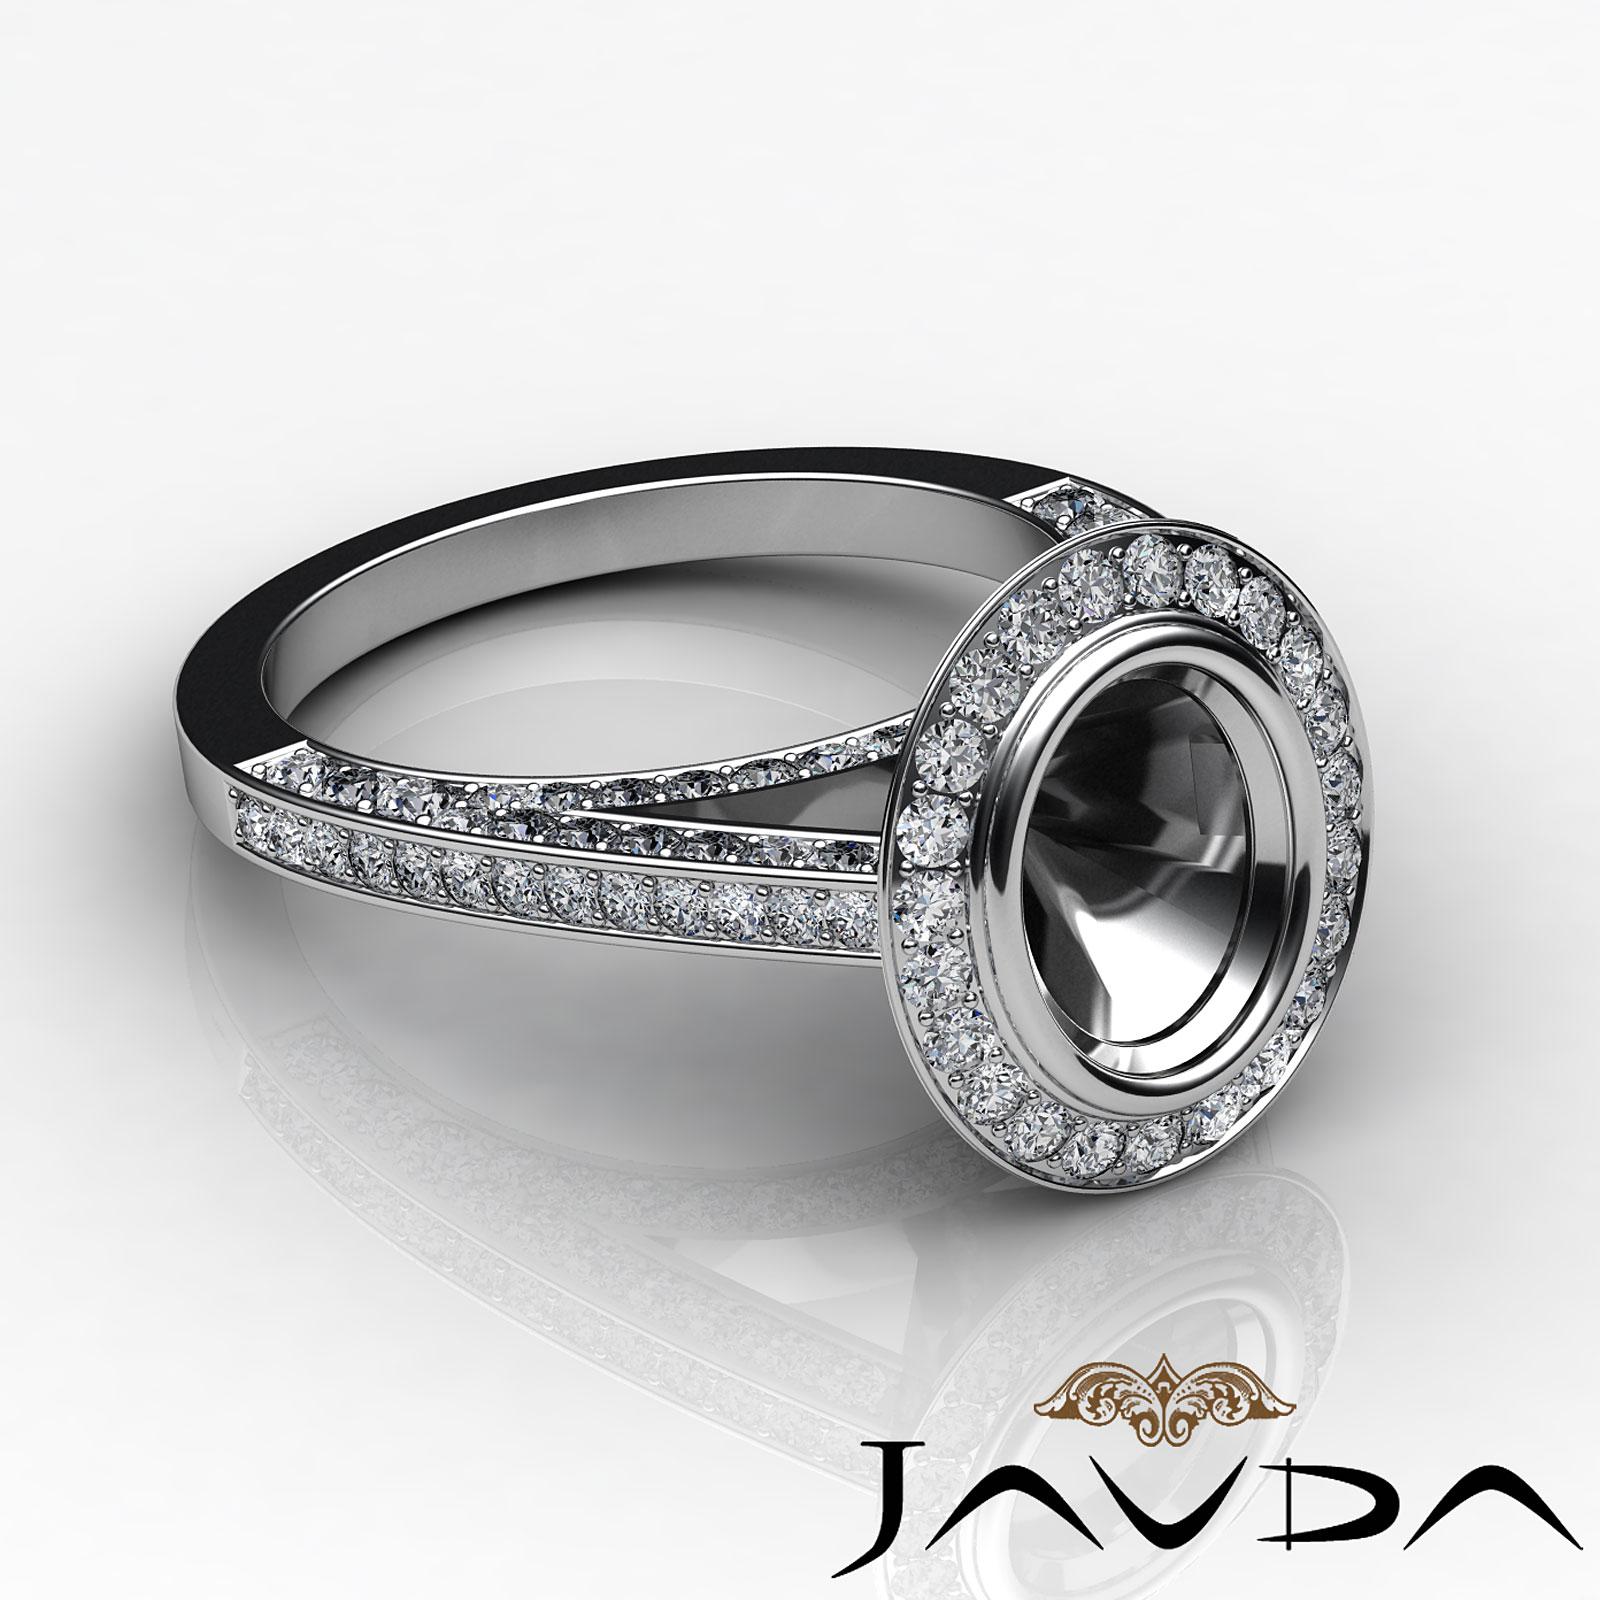 diamond engagement ring oval cut semi mount bezel setting. Black Bedroom Furniture Sets. Home Design Ideas